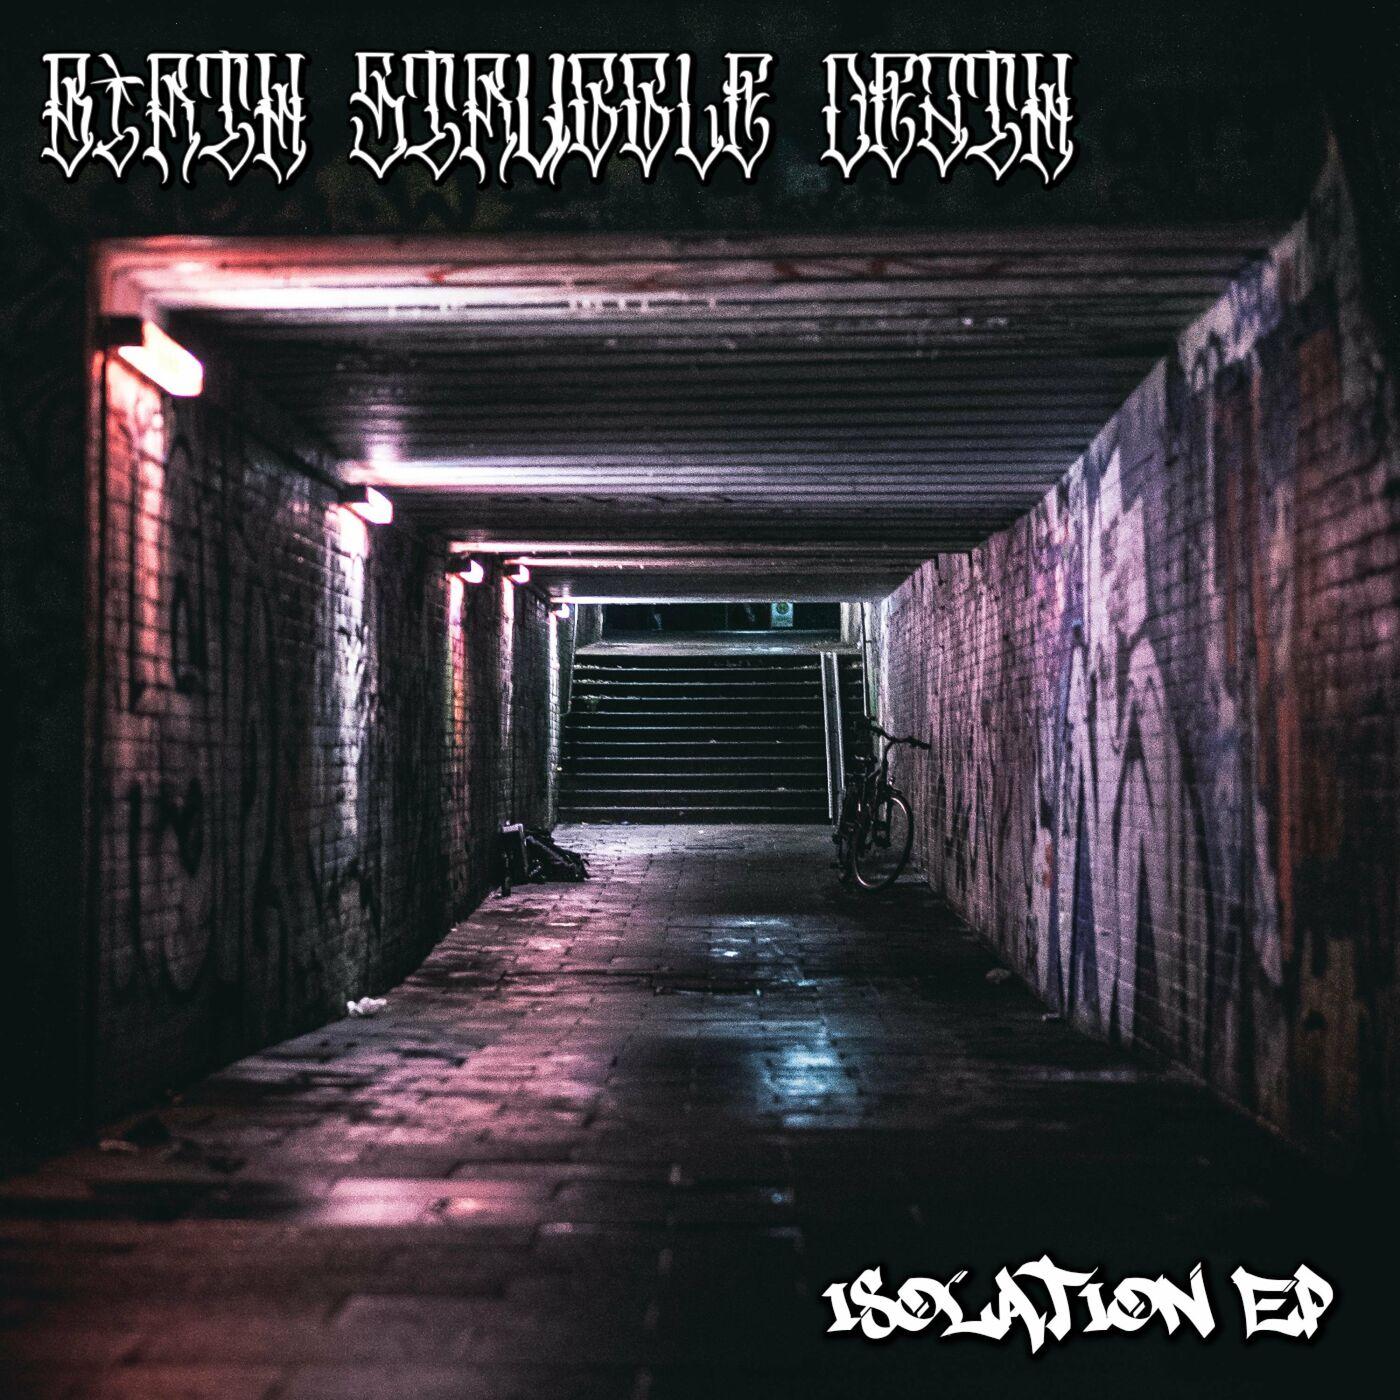 Birth Struggle Death - Isolation [EP] (2020)